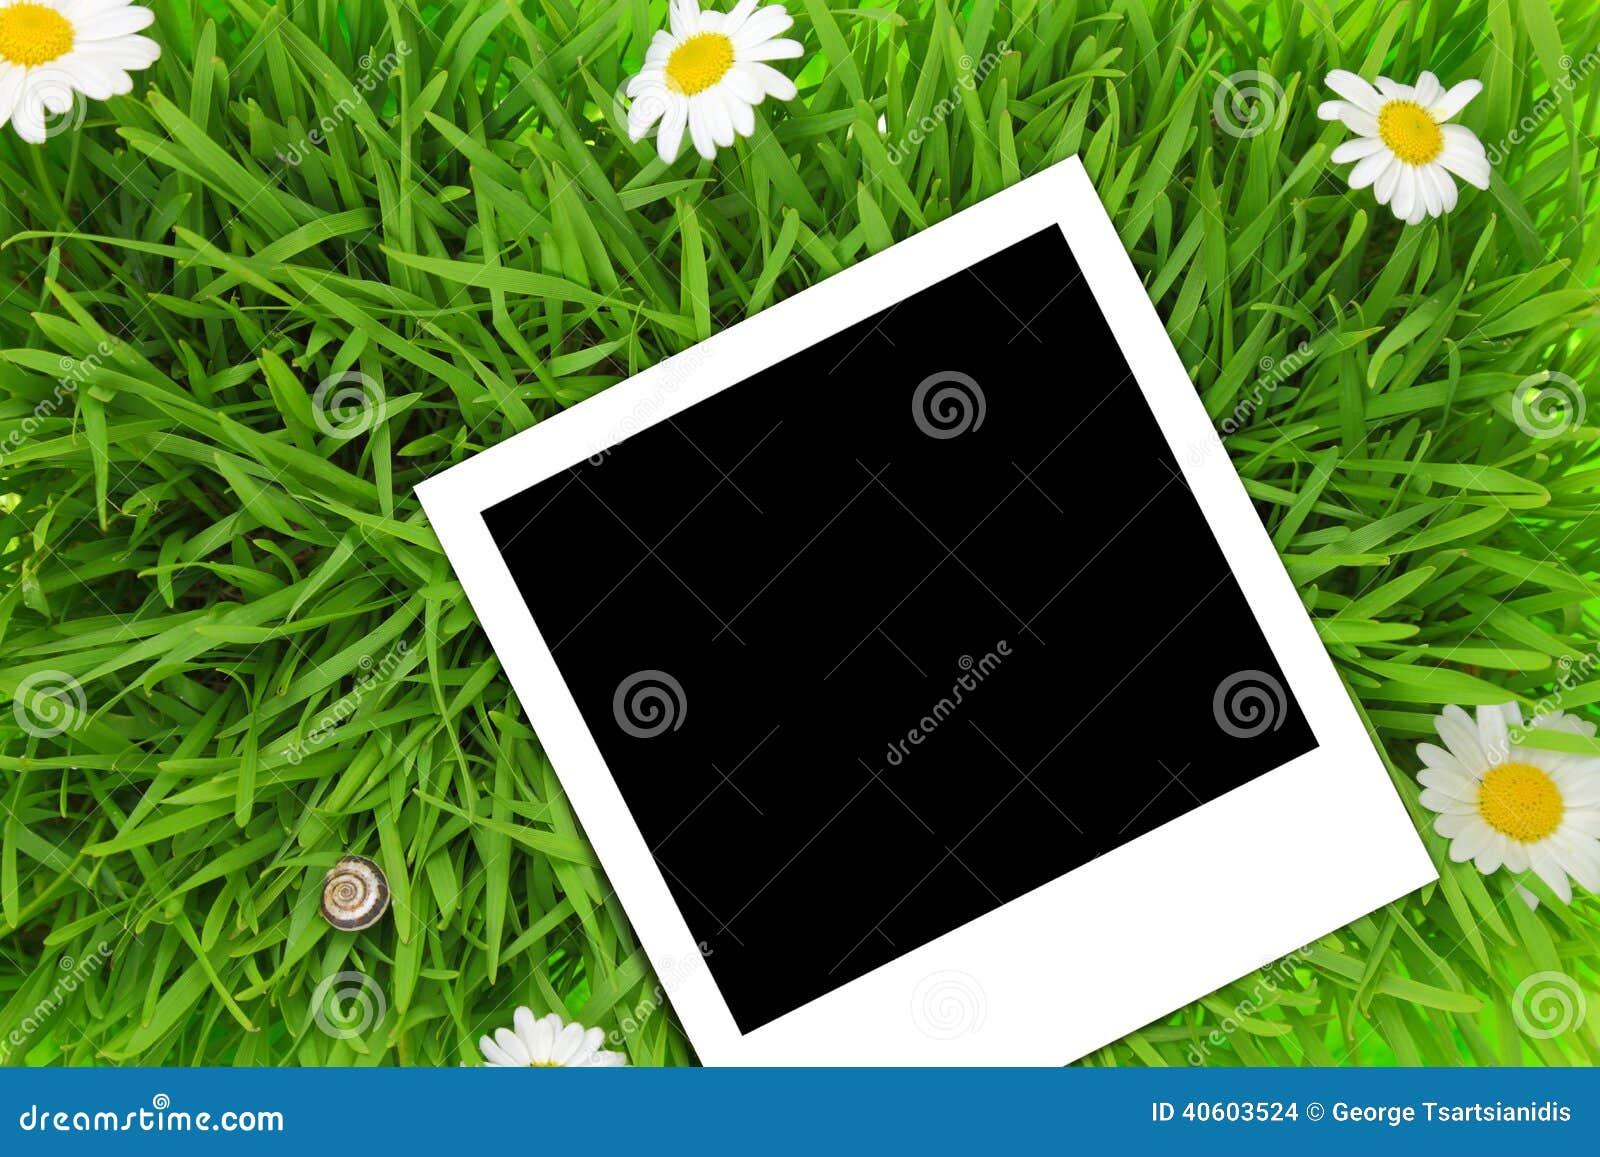 Photograph Template Stock photo: blank photograph template